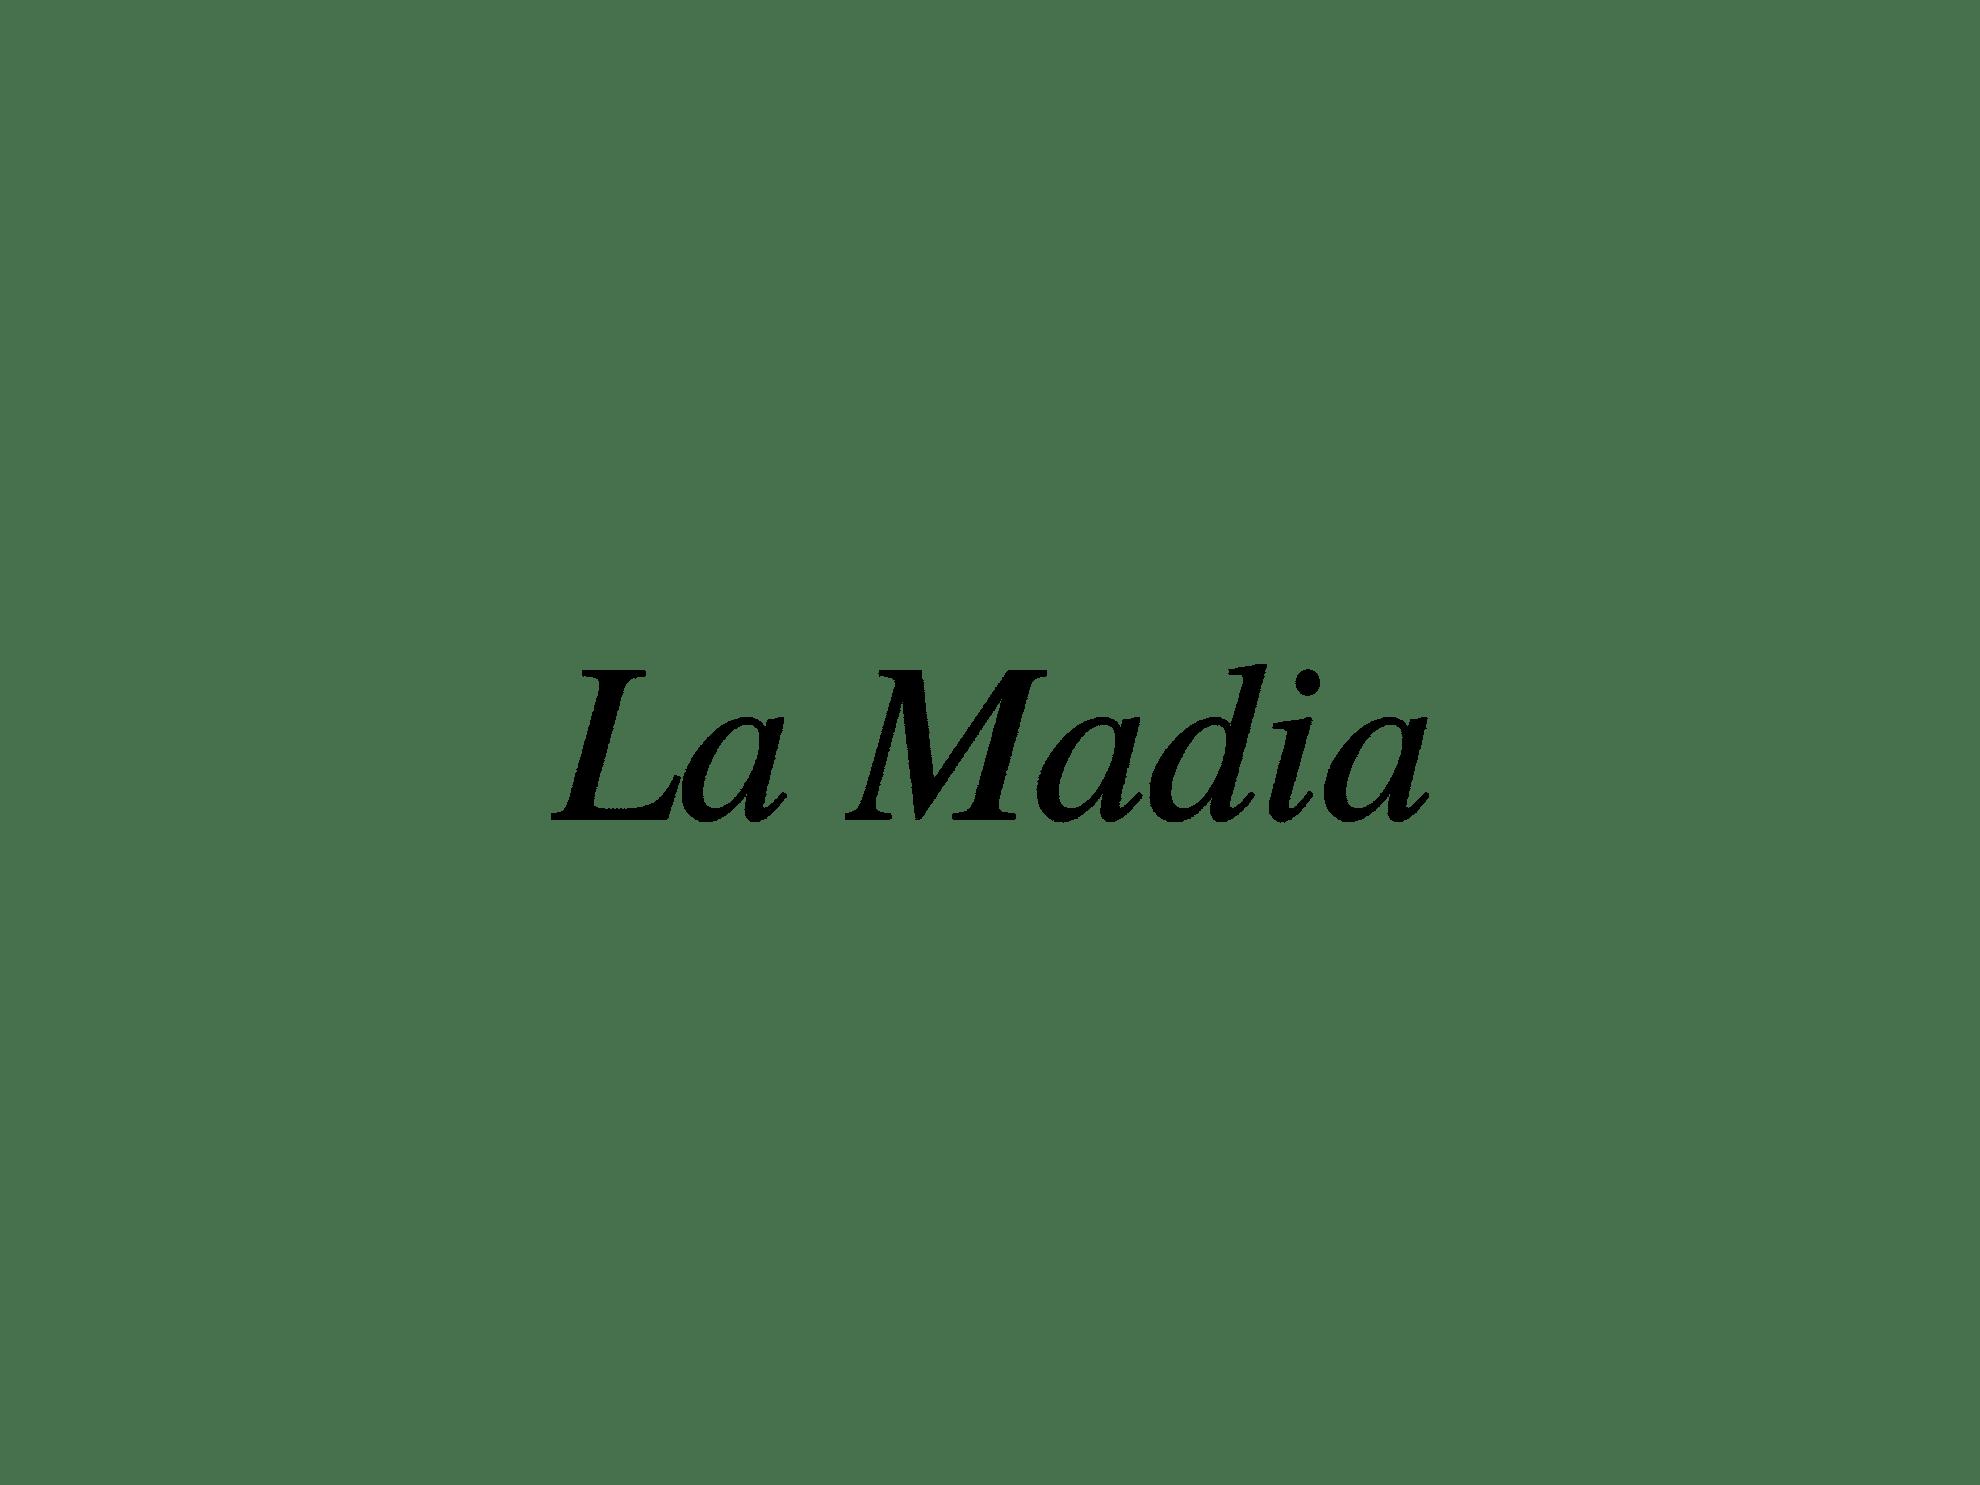 logo madia - siena - agenzia comunicazione